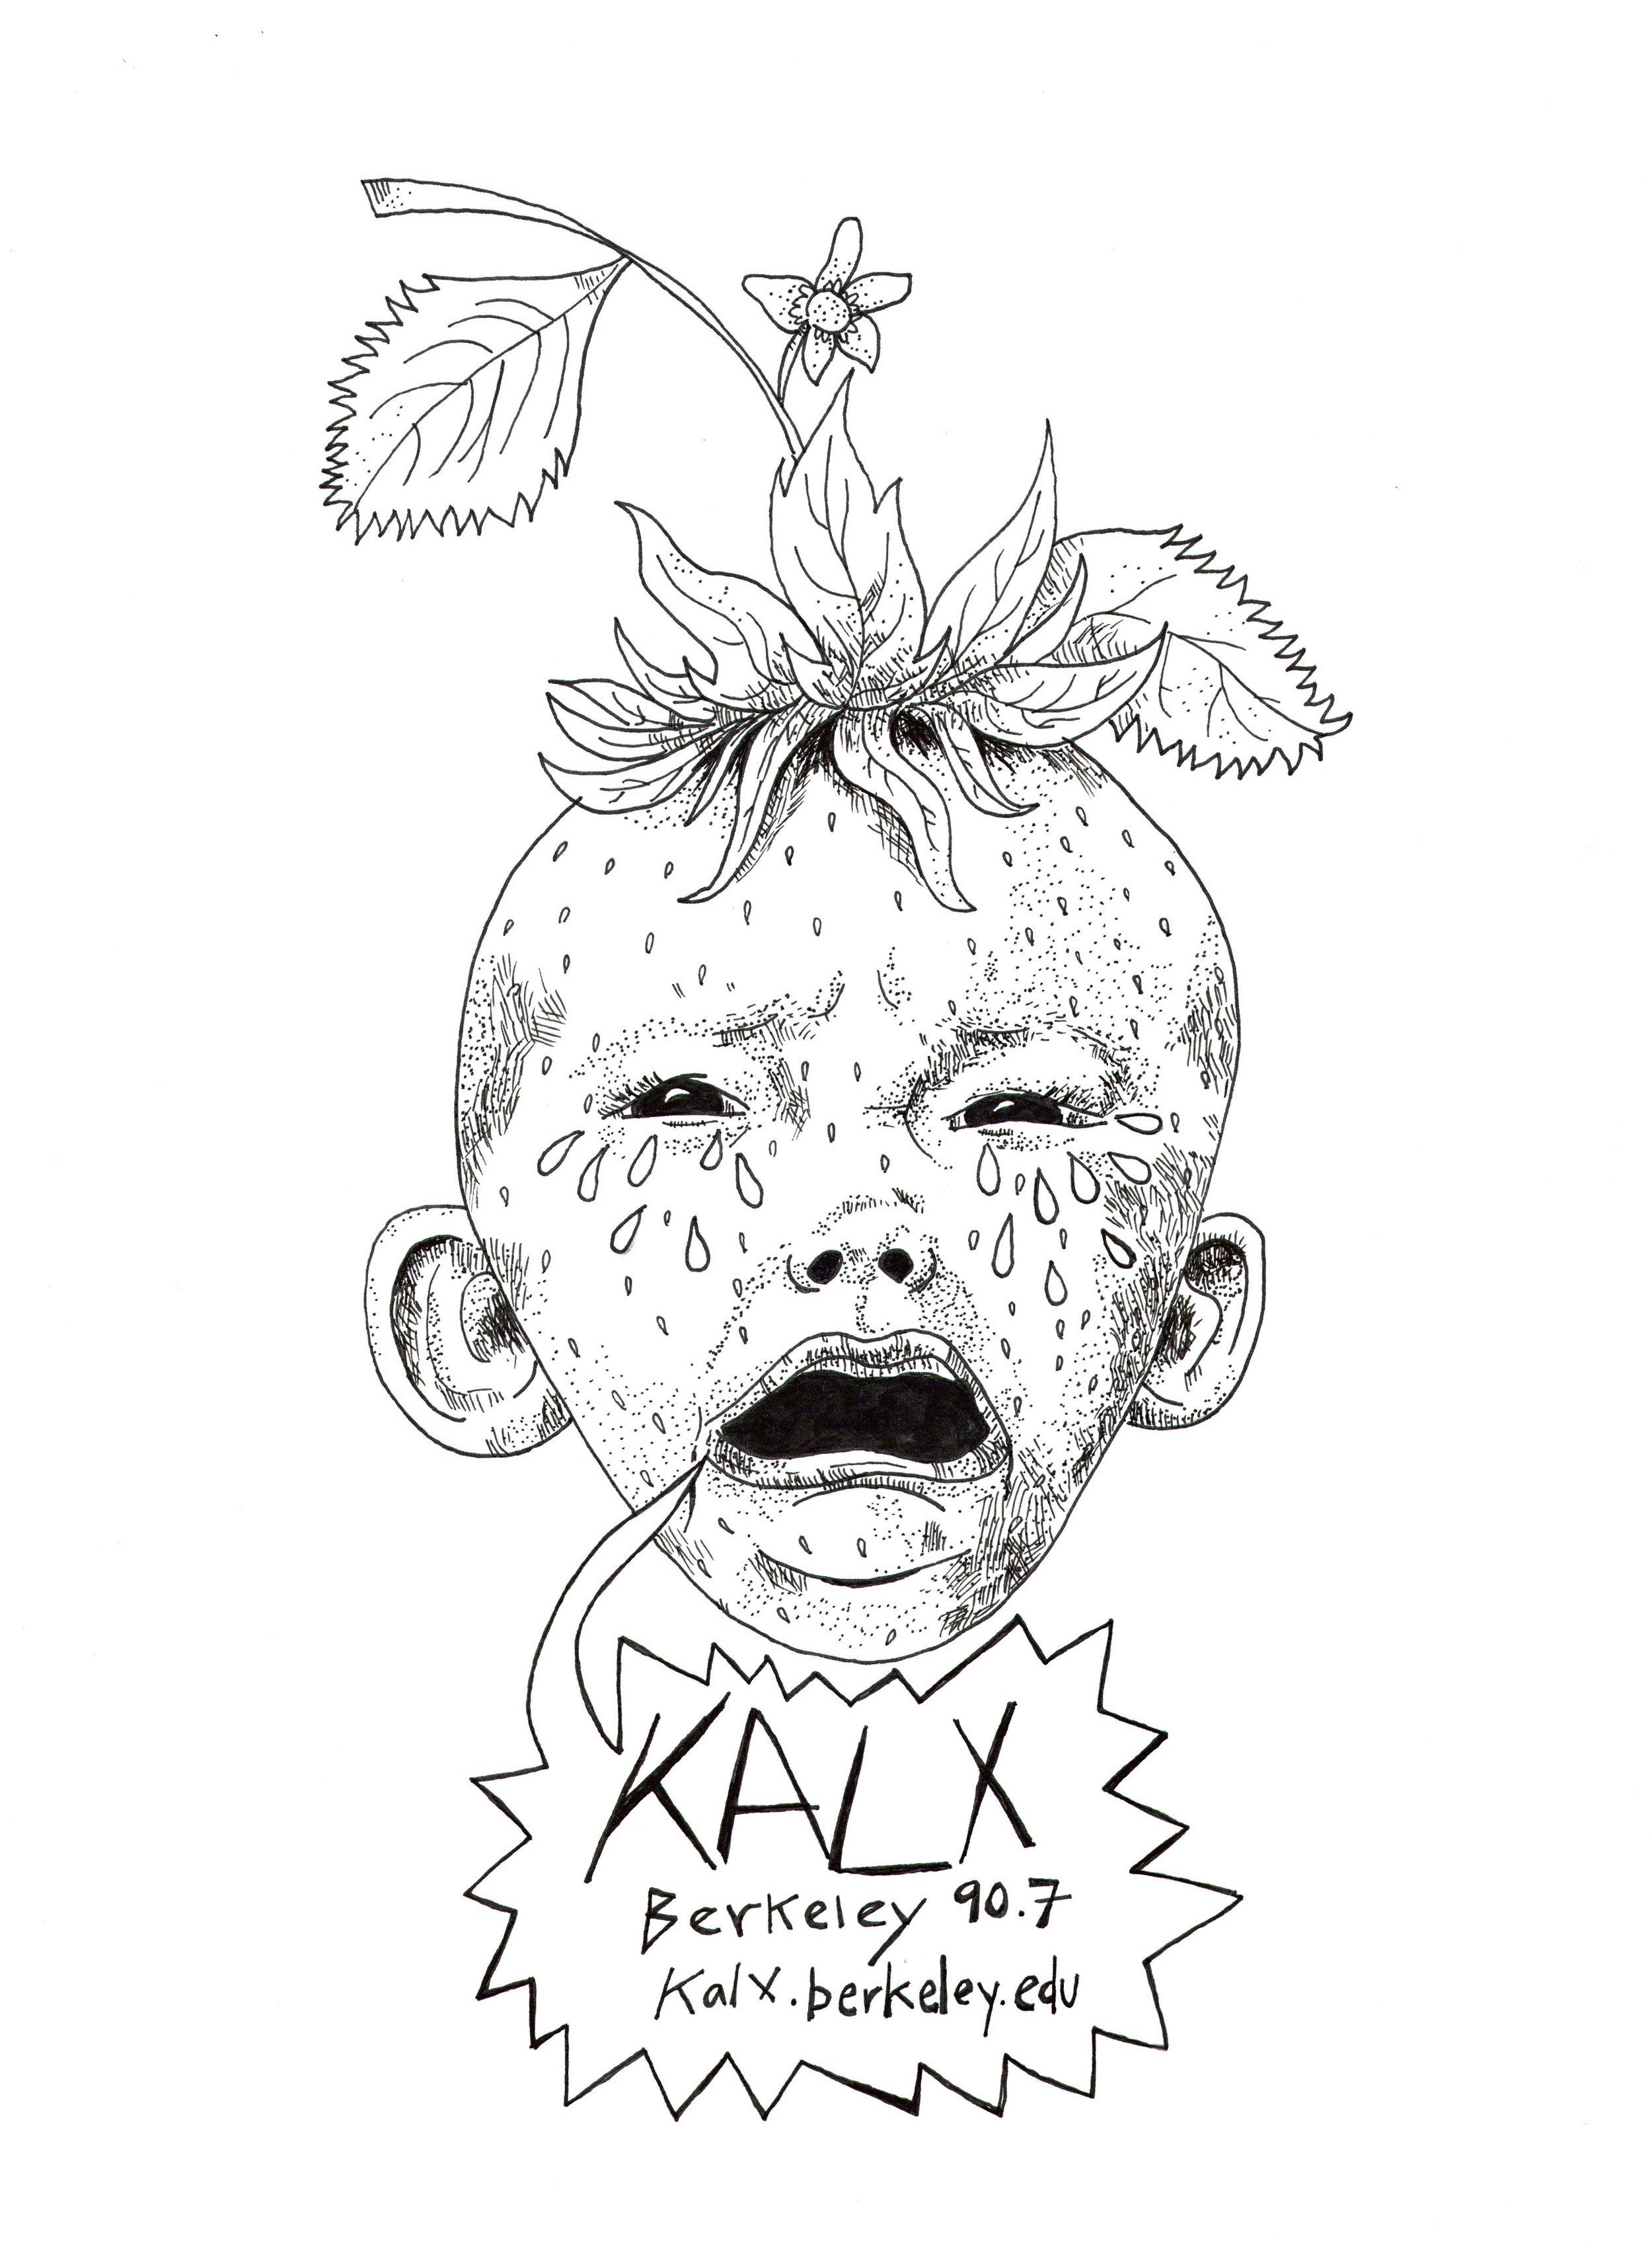 KALX Radio Station t-shirt design. 2016.